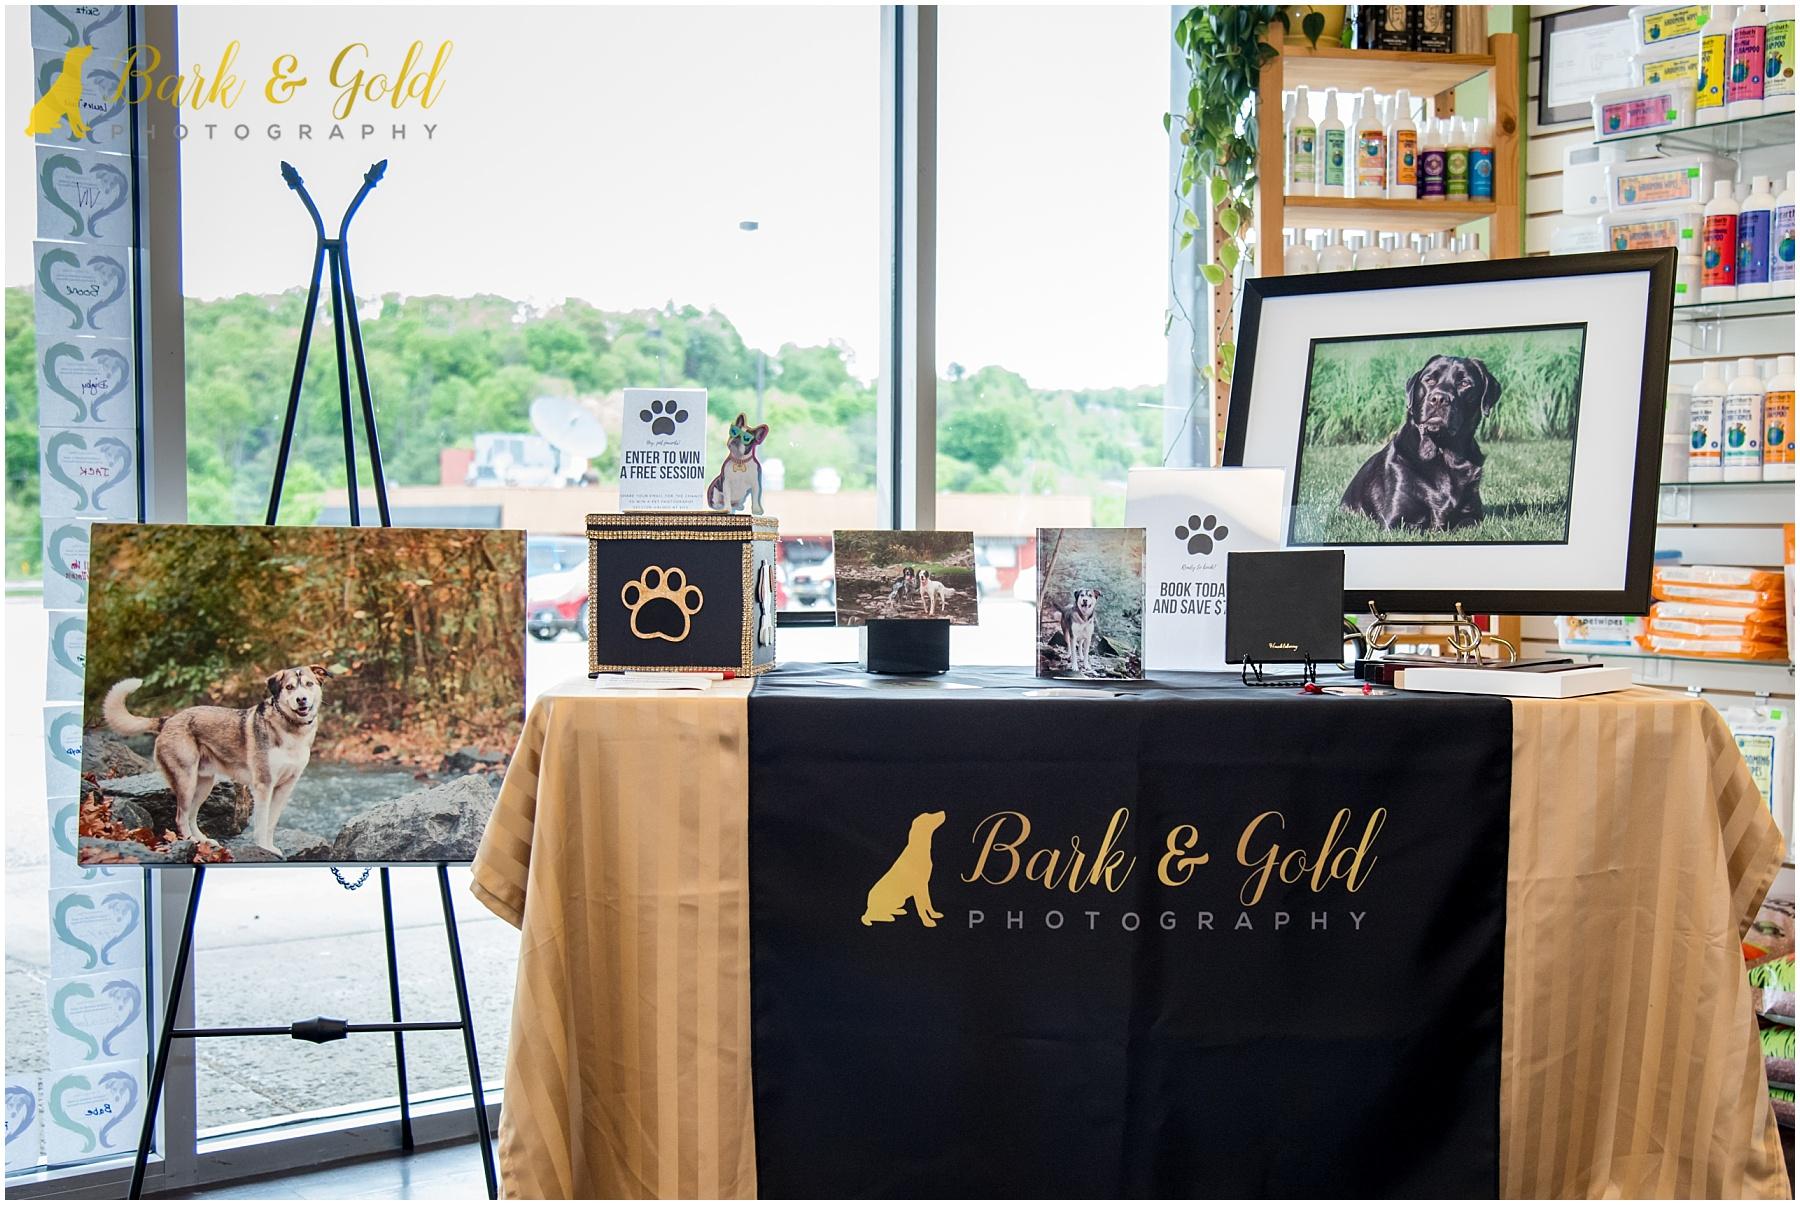 Bark & Gold Photography vendor display at Healthy Pet Day 2018